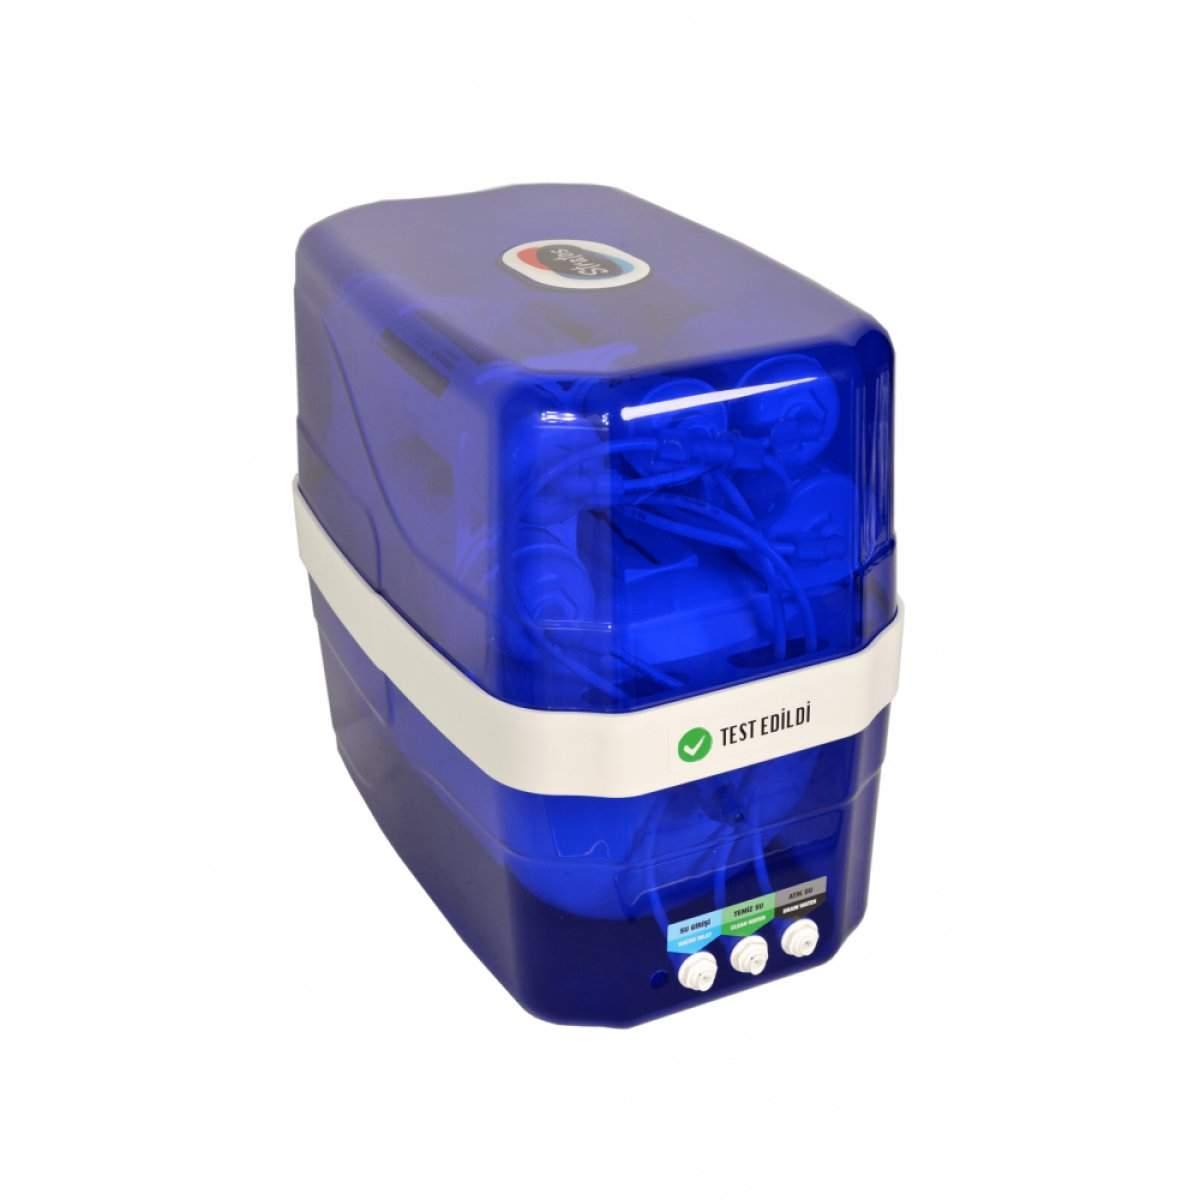 AquaTürk Stratos Premium Kompakt Su arıtma Cihazı(3-05-STR-IN)Mavi